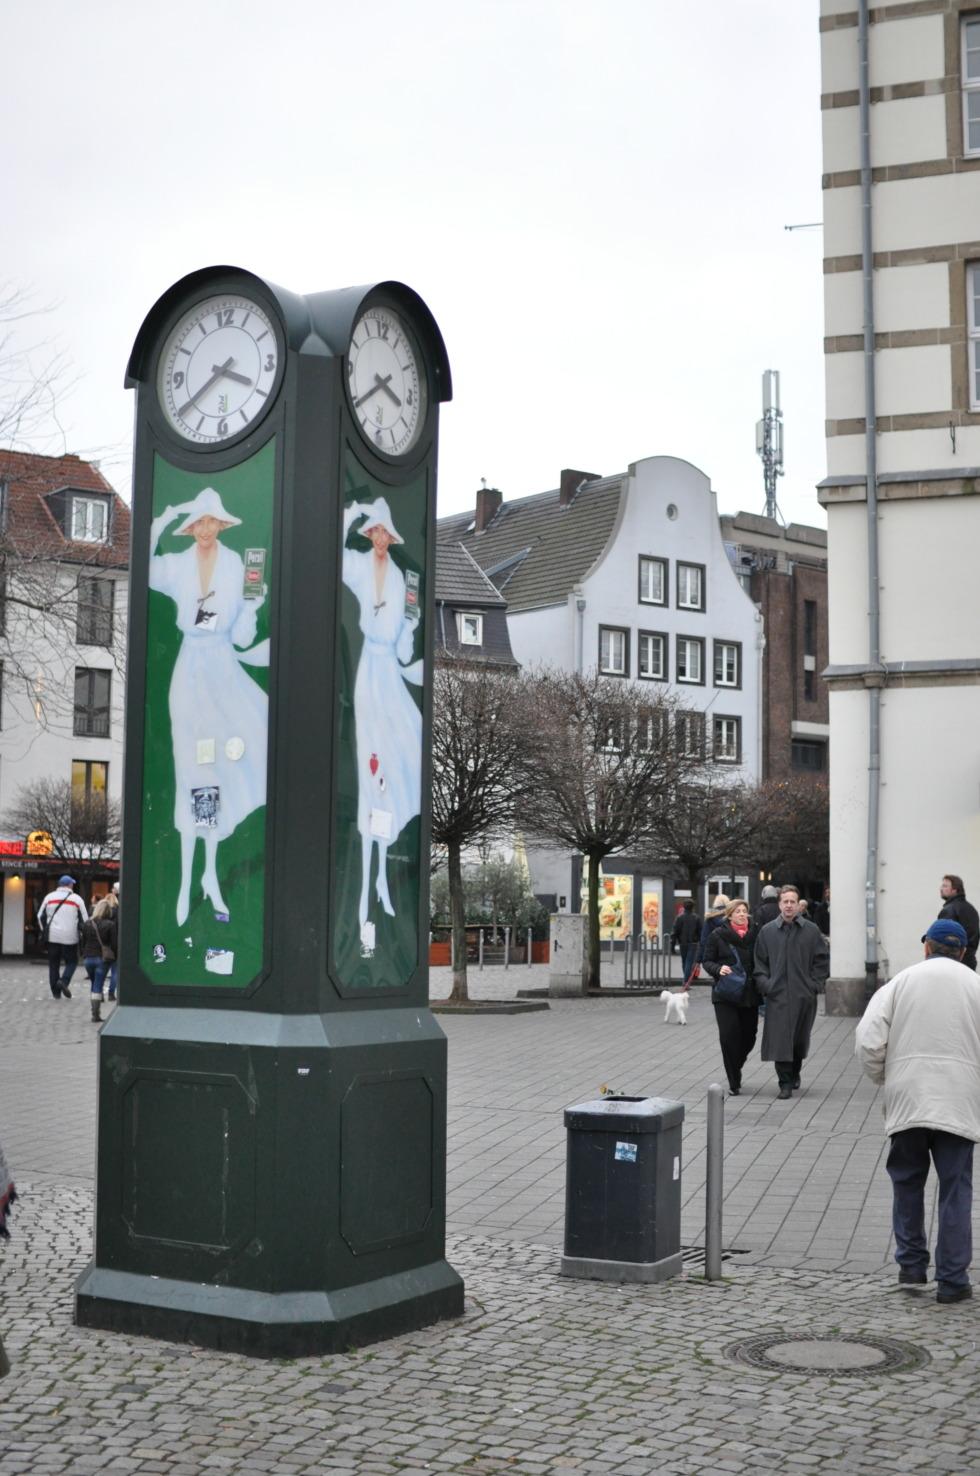 Old Persil advertising kiosk in Düsseldorf